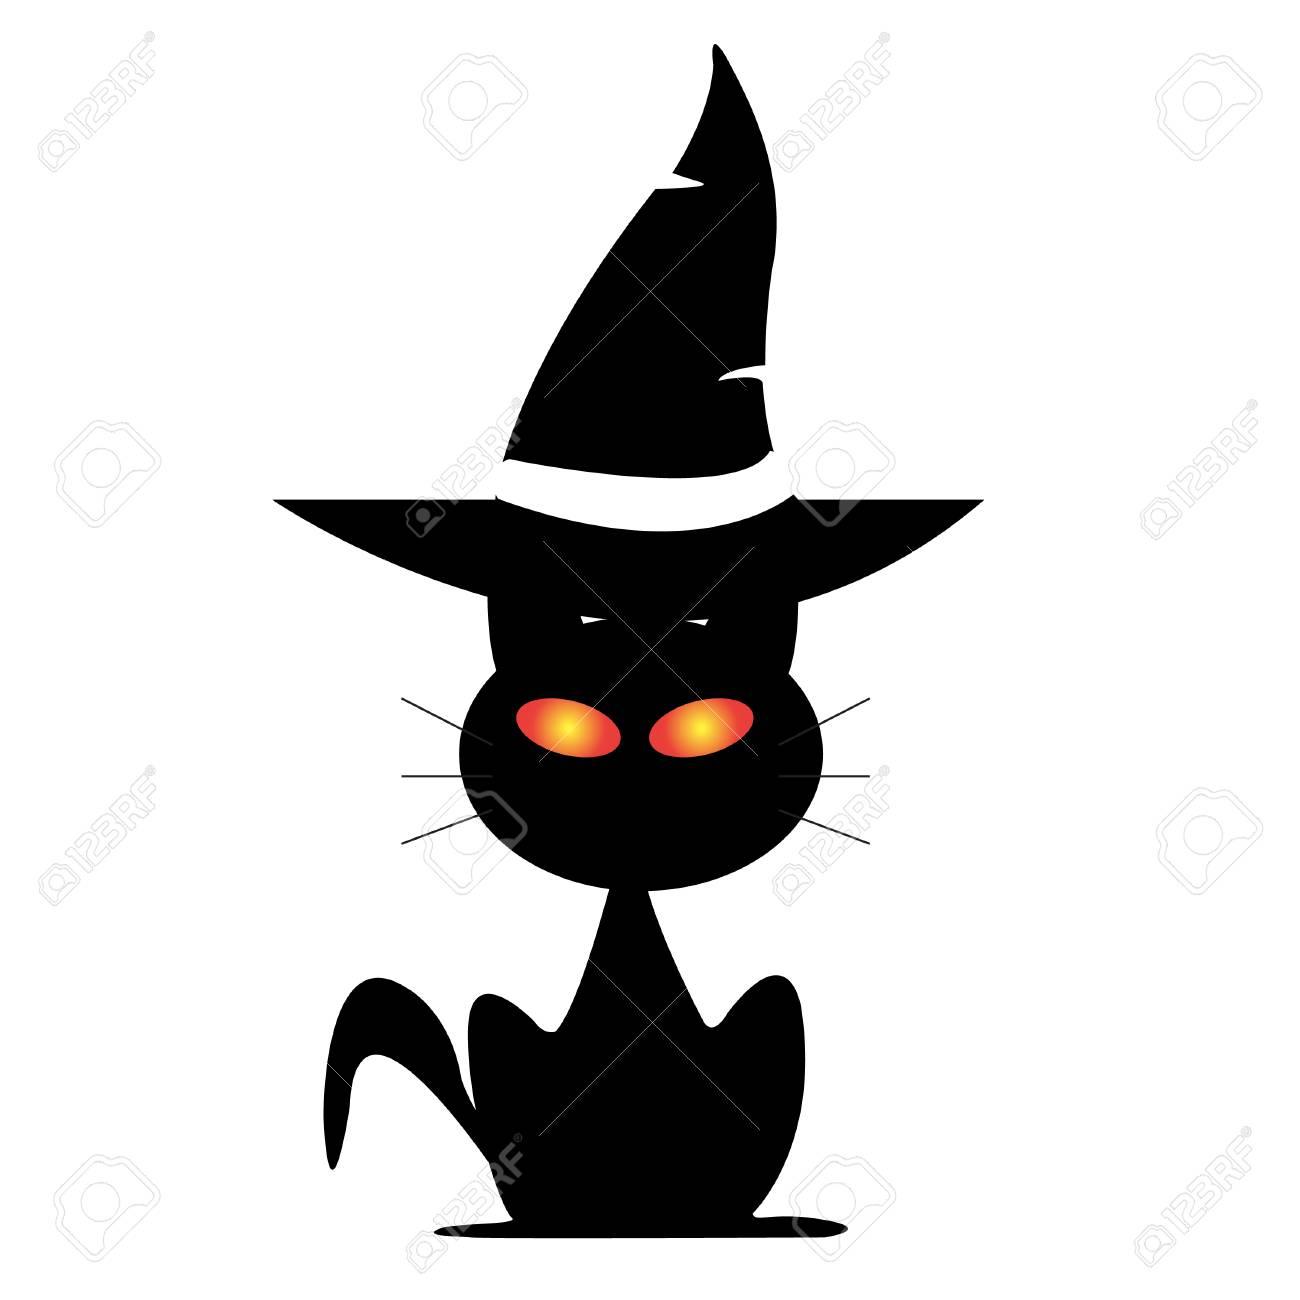 Halloween cat under witch's hat vector.